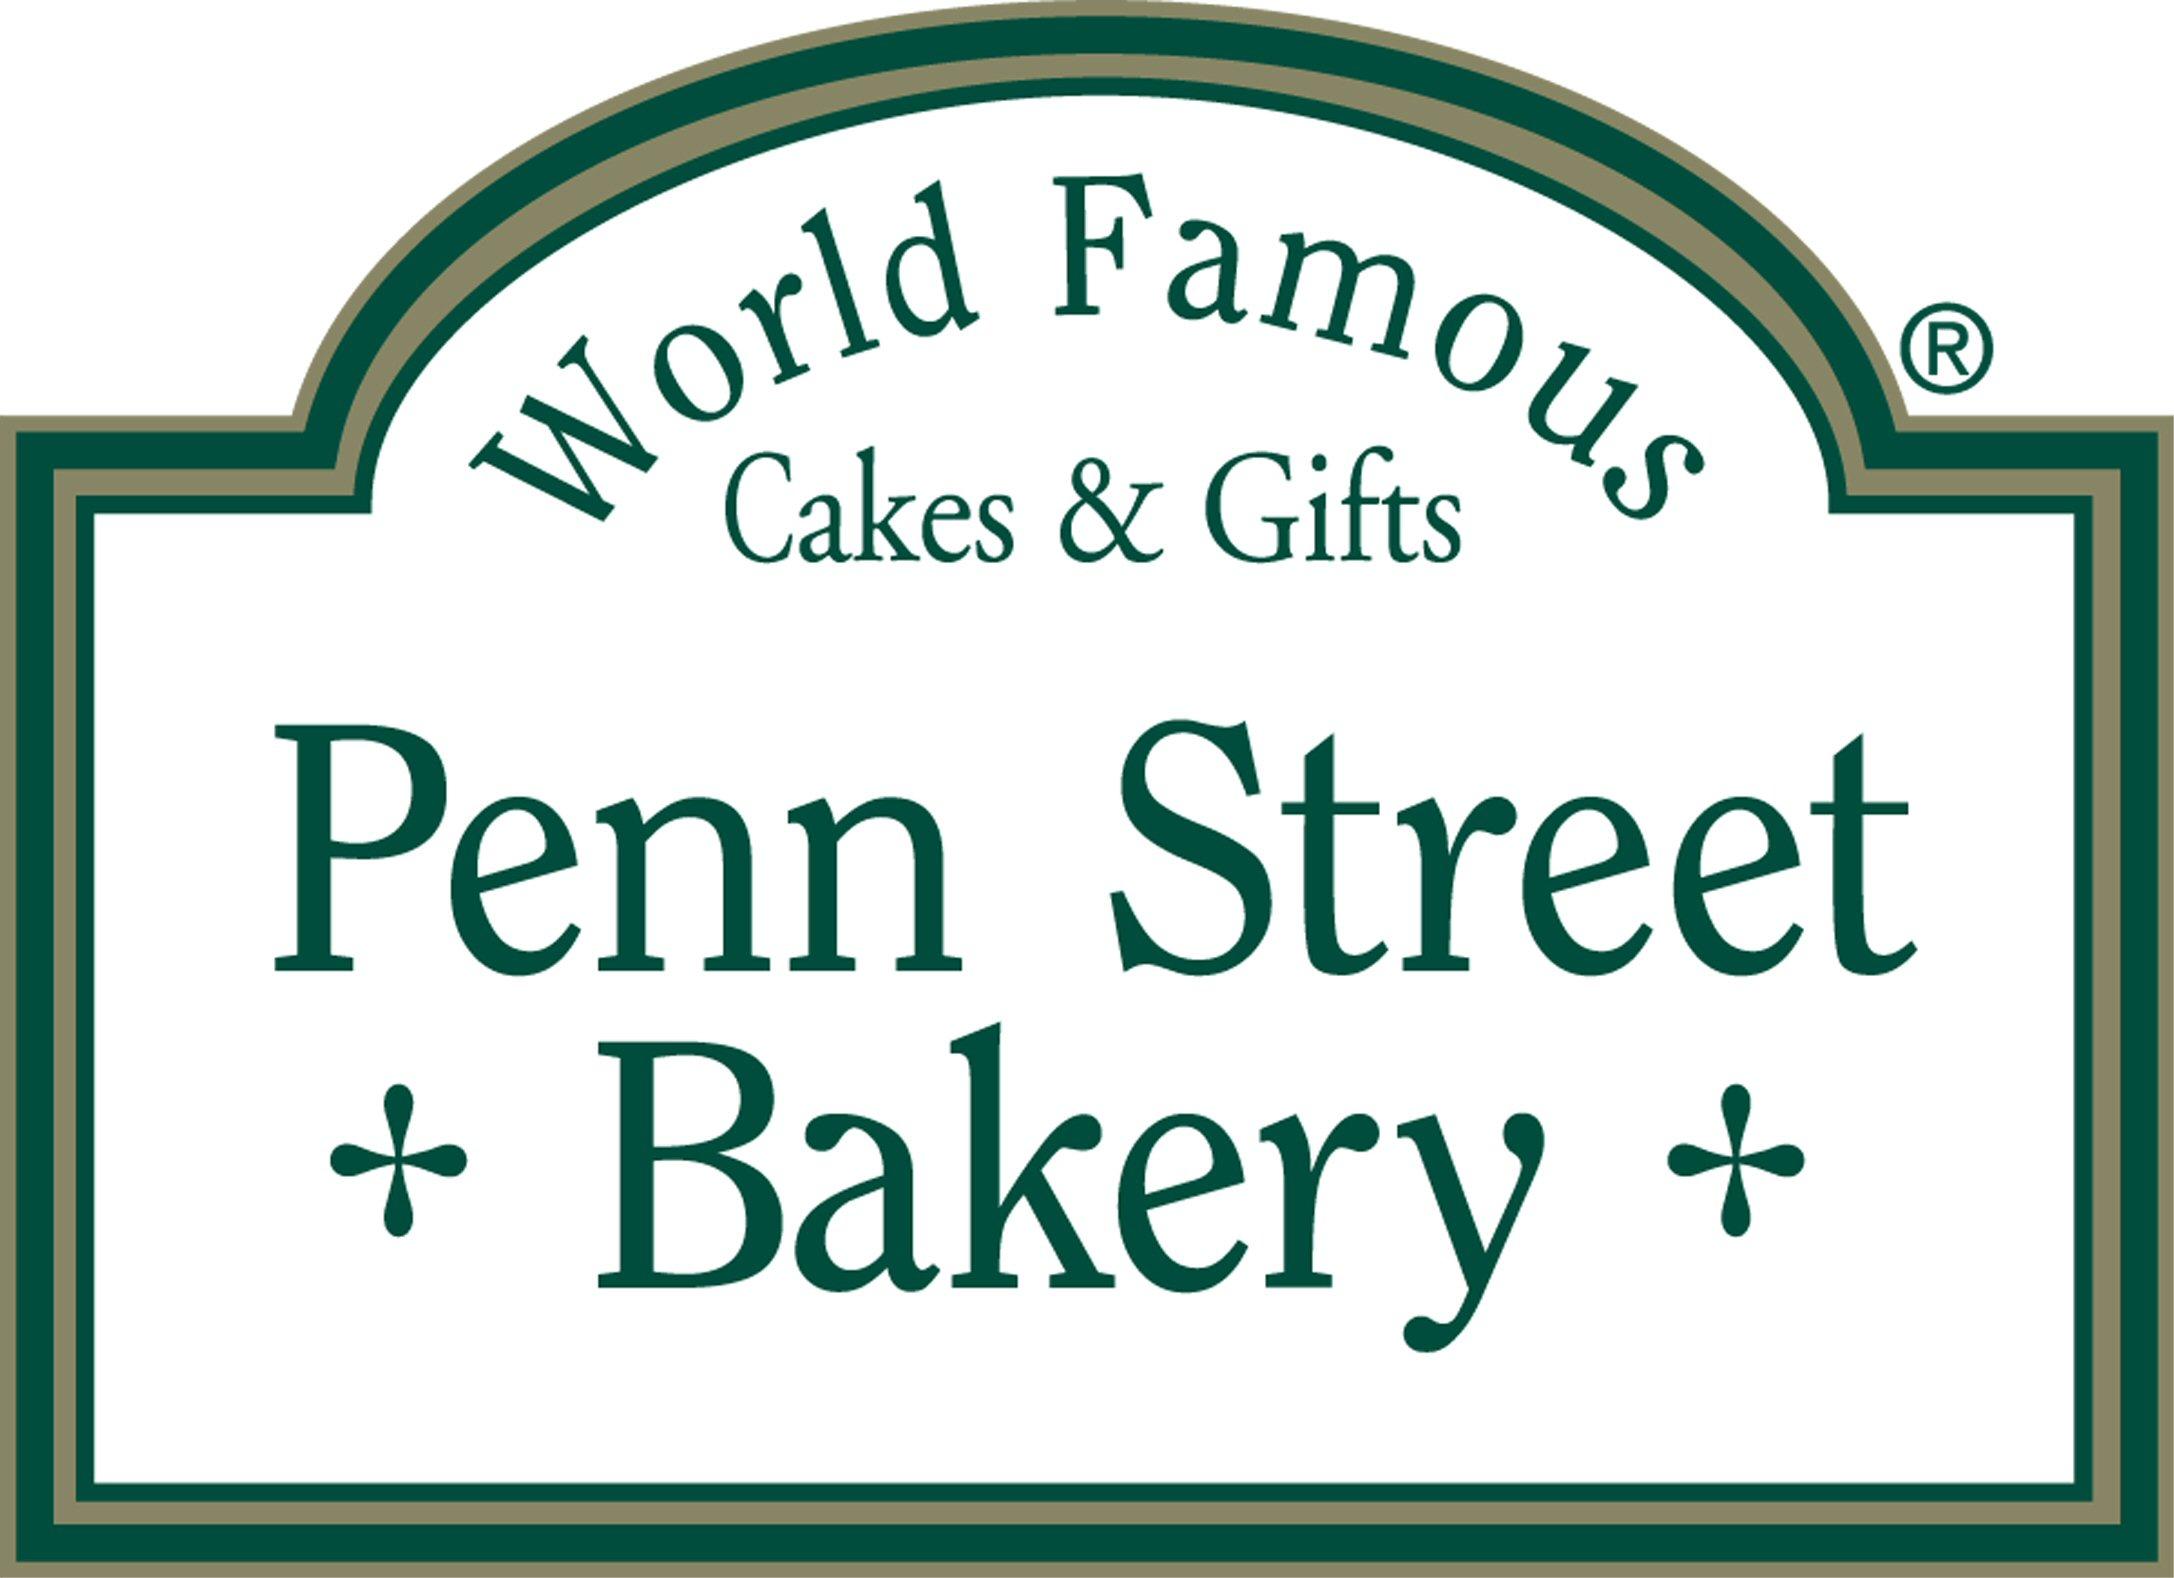 Penn Street Bakery